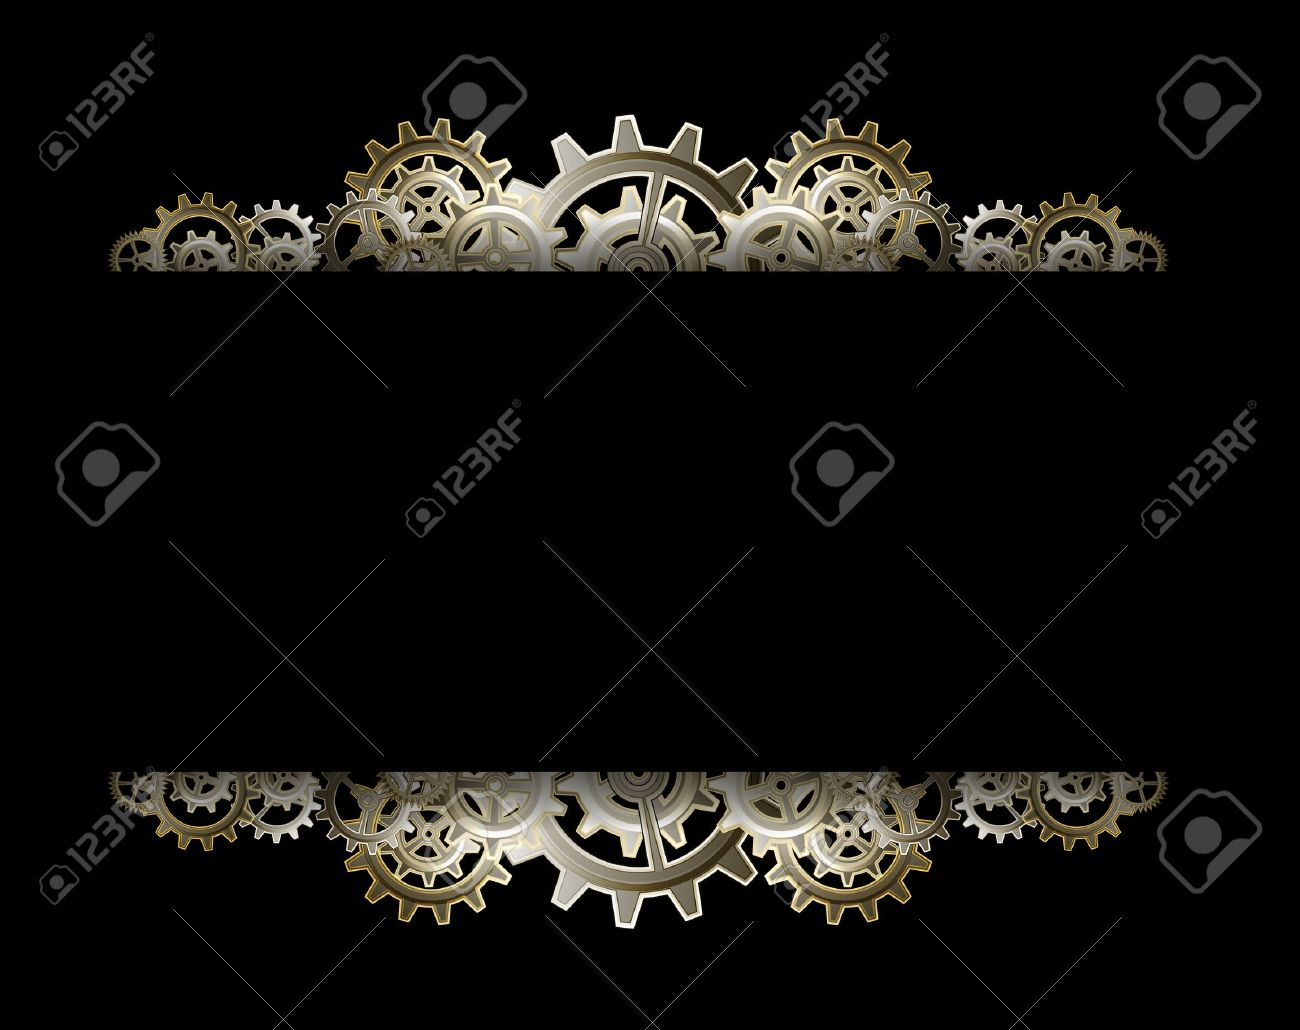 Steampunk gears frame Stock Vector - 24012680